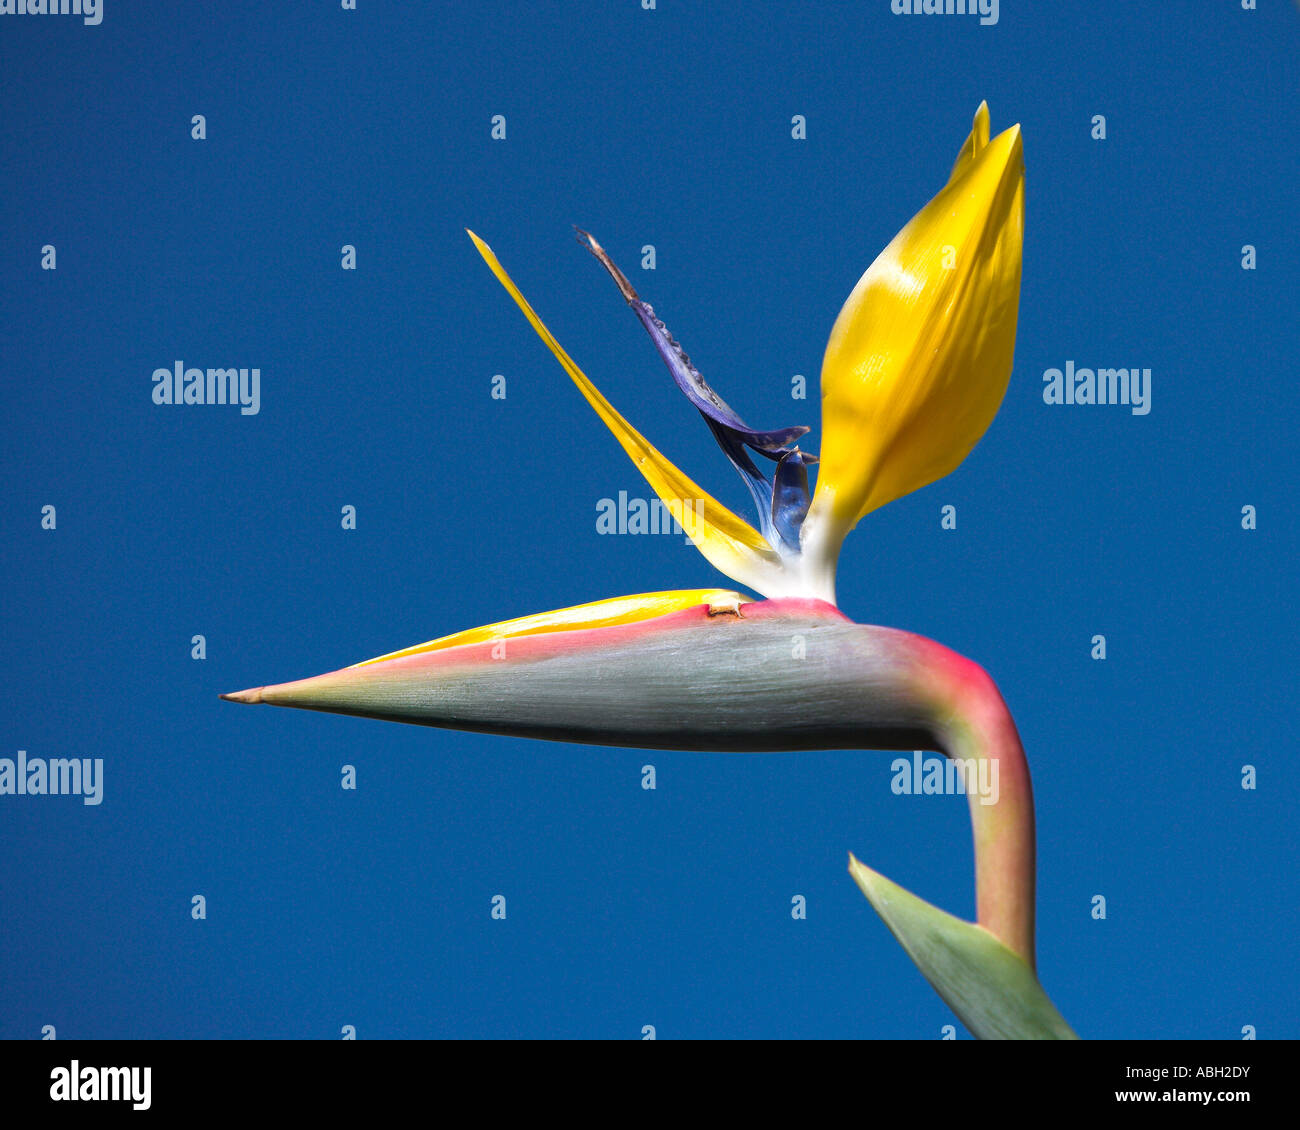 Strelitzia reginae Bird of paradise background blue sky - Stock Image